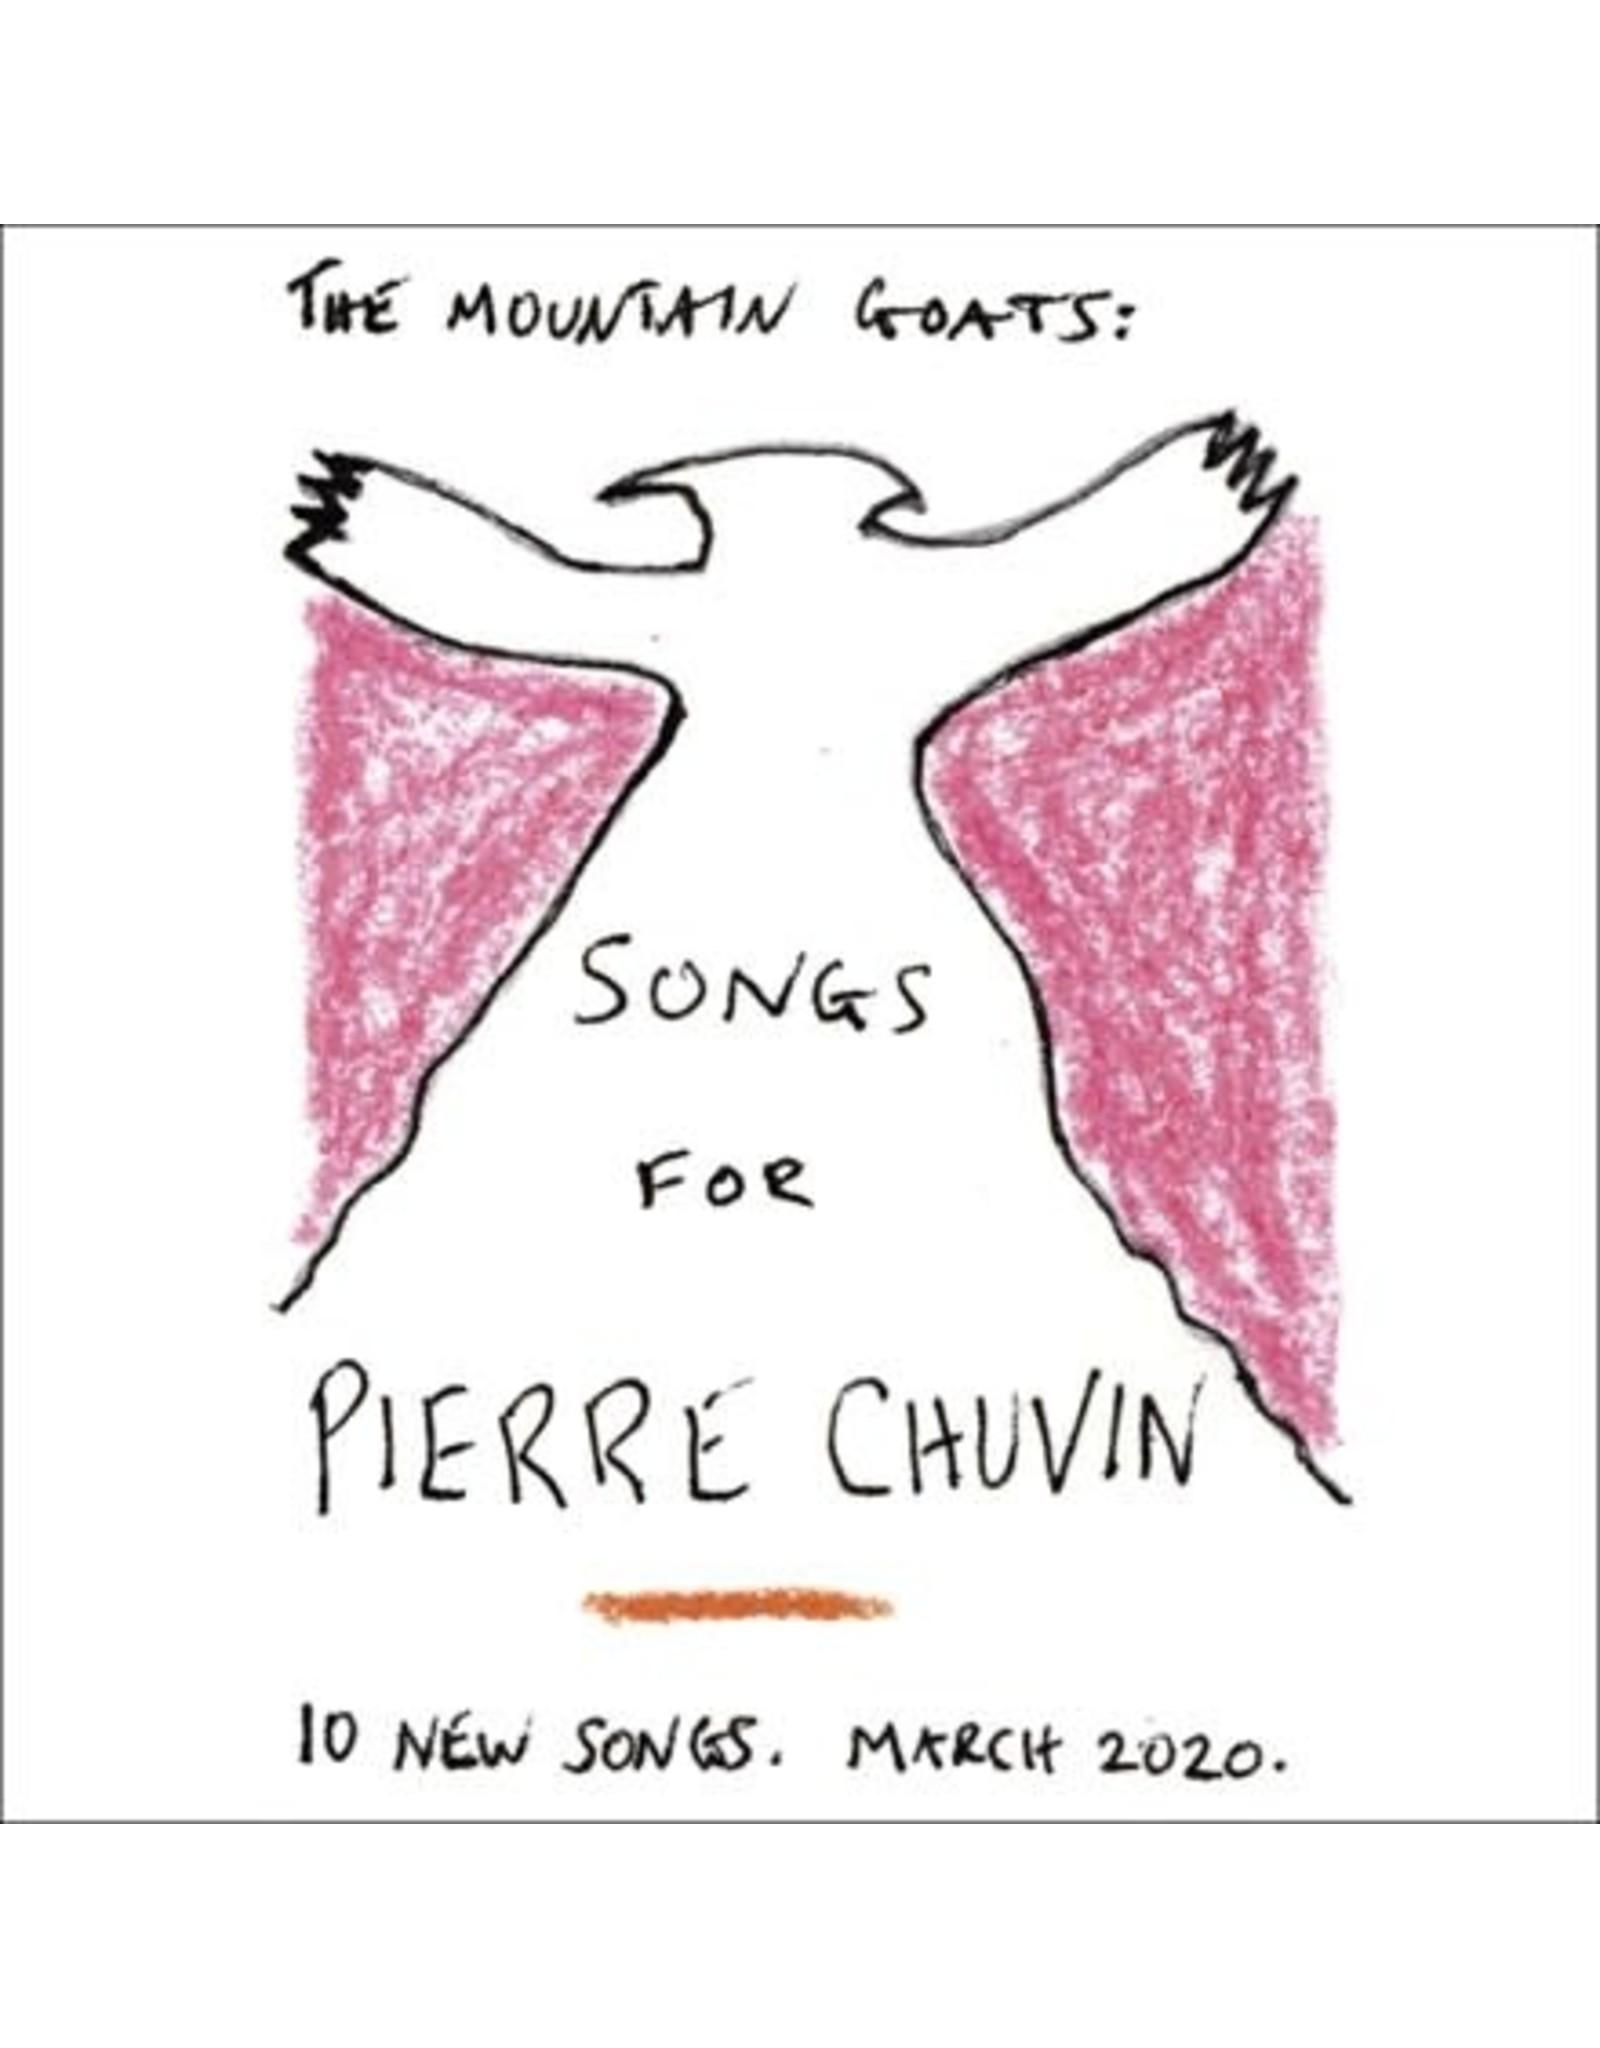 Mountain Goats: Songs For Pierre Chuvin (Peak Vinyl indie shop version) LP